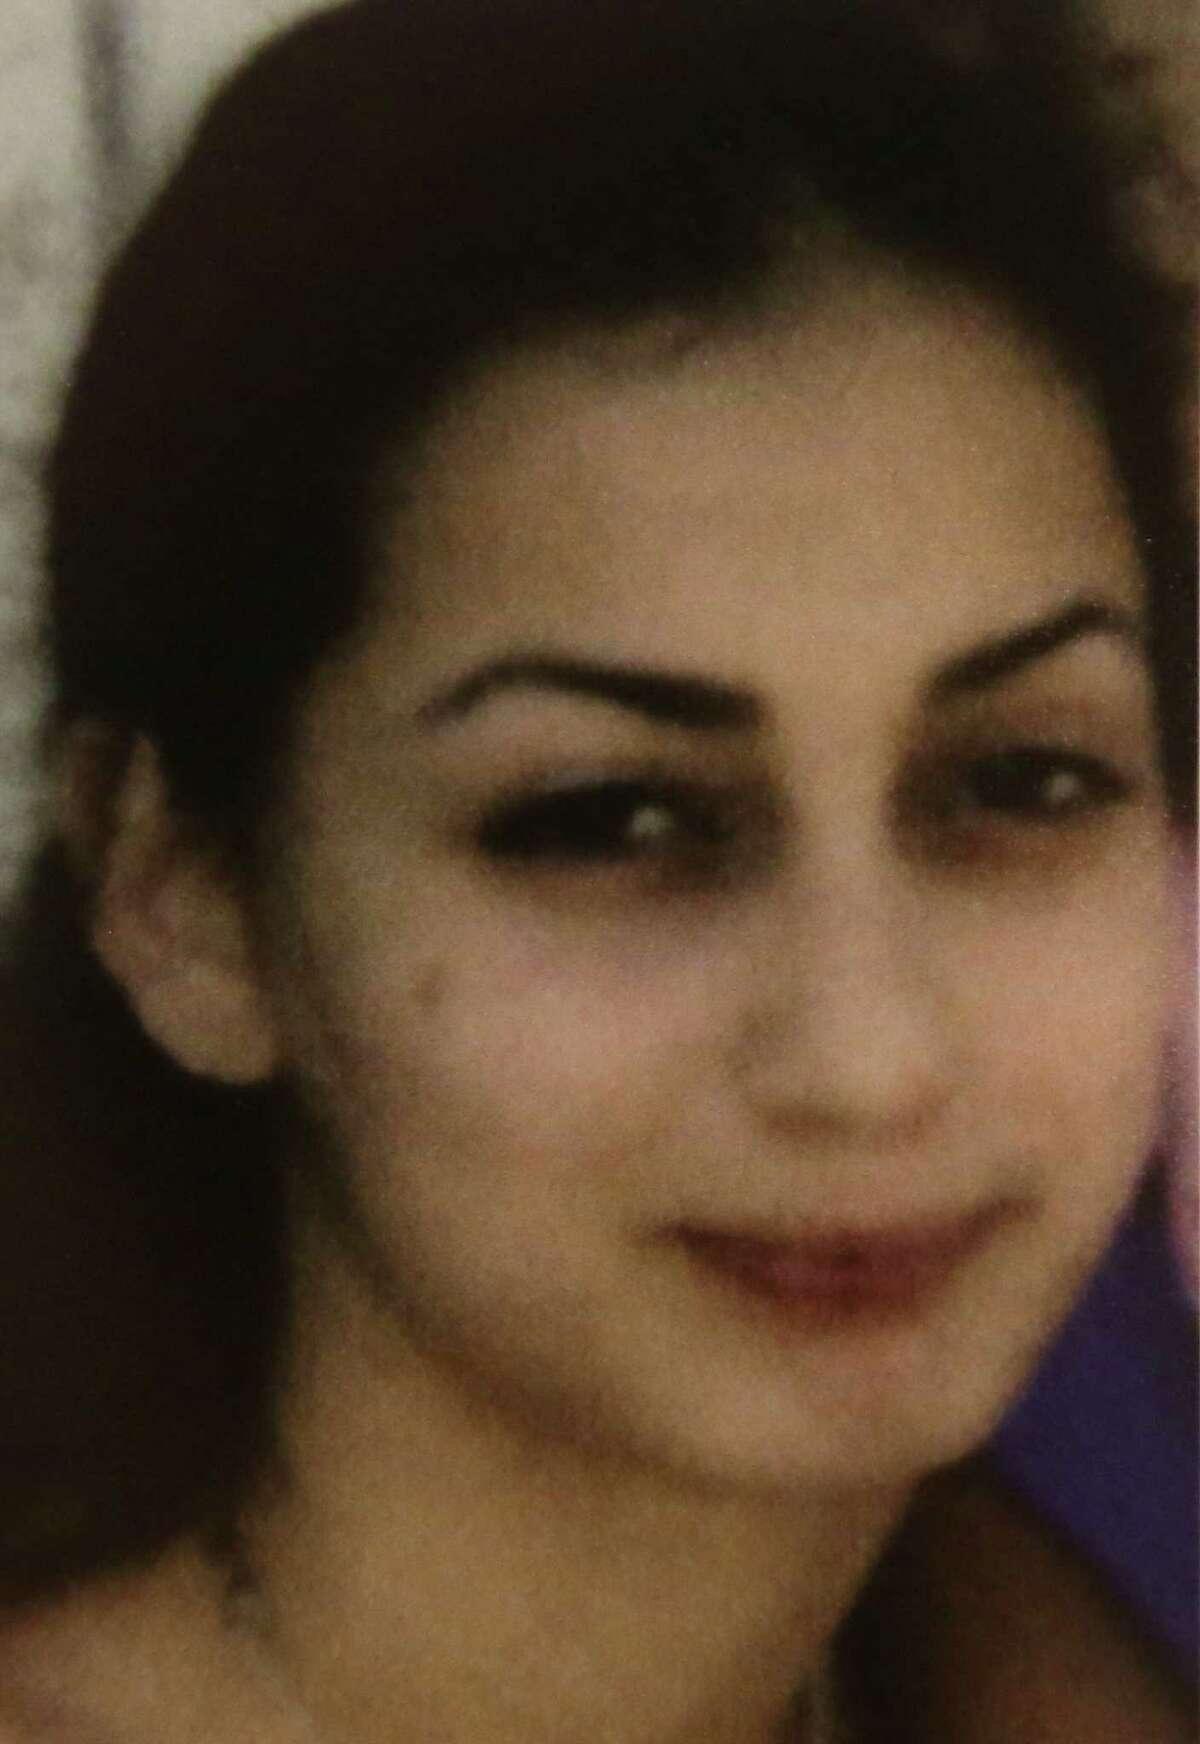 Lenora Ivie Frago was working as an escort.